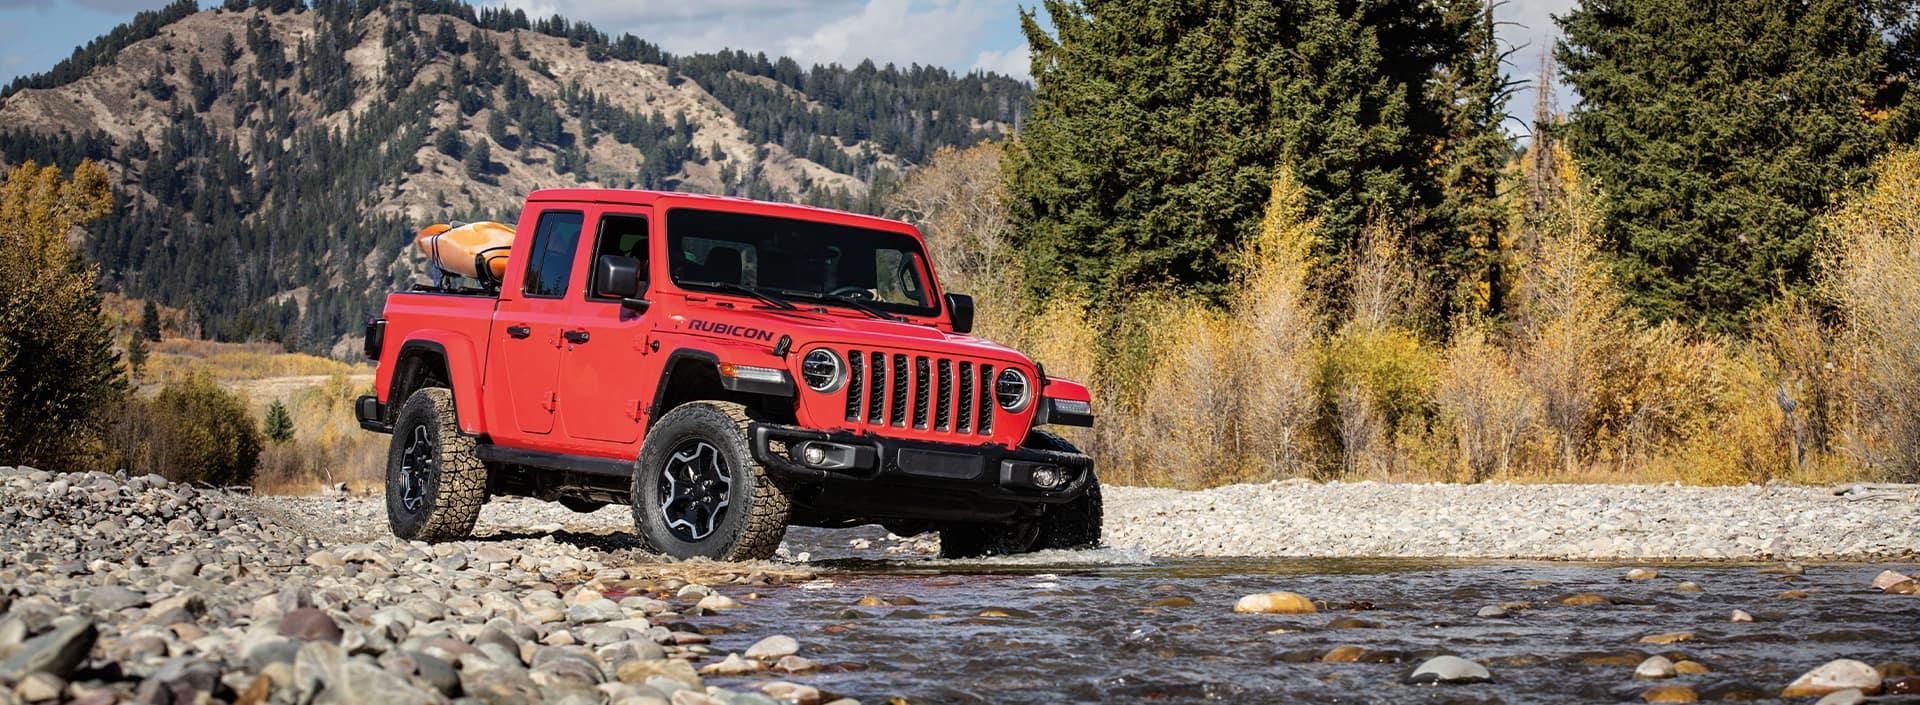 Welcome to Scott Robinson Chrysler Dodge Jeep Ram